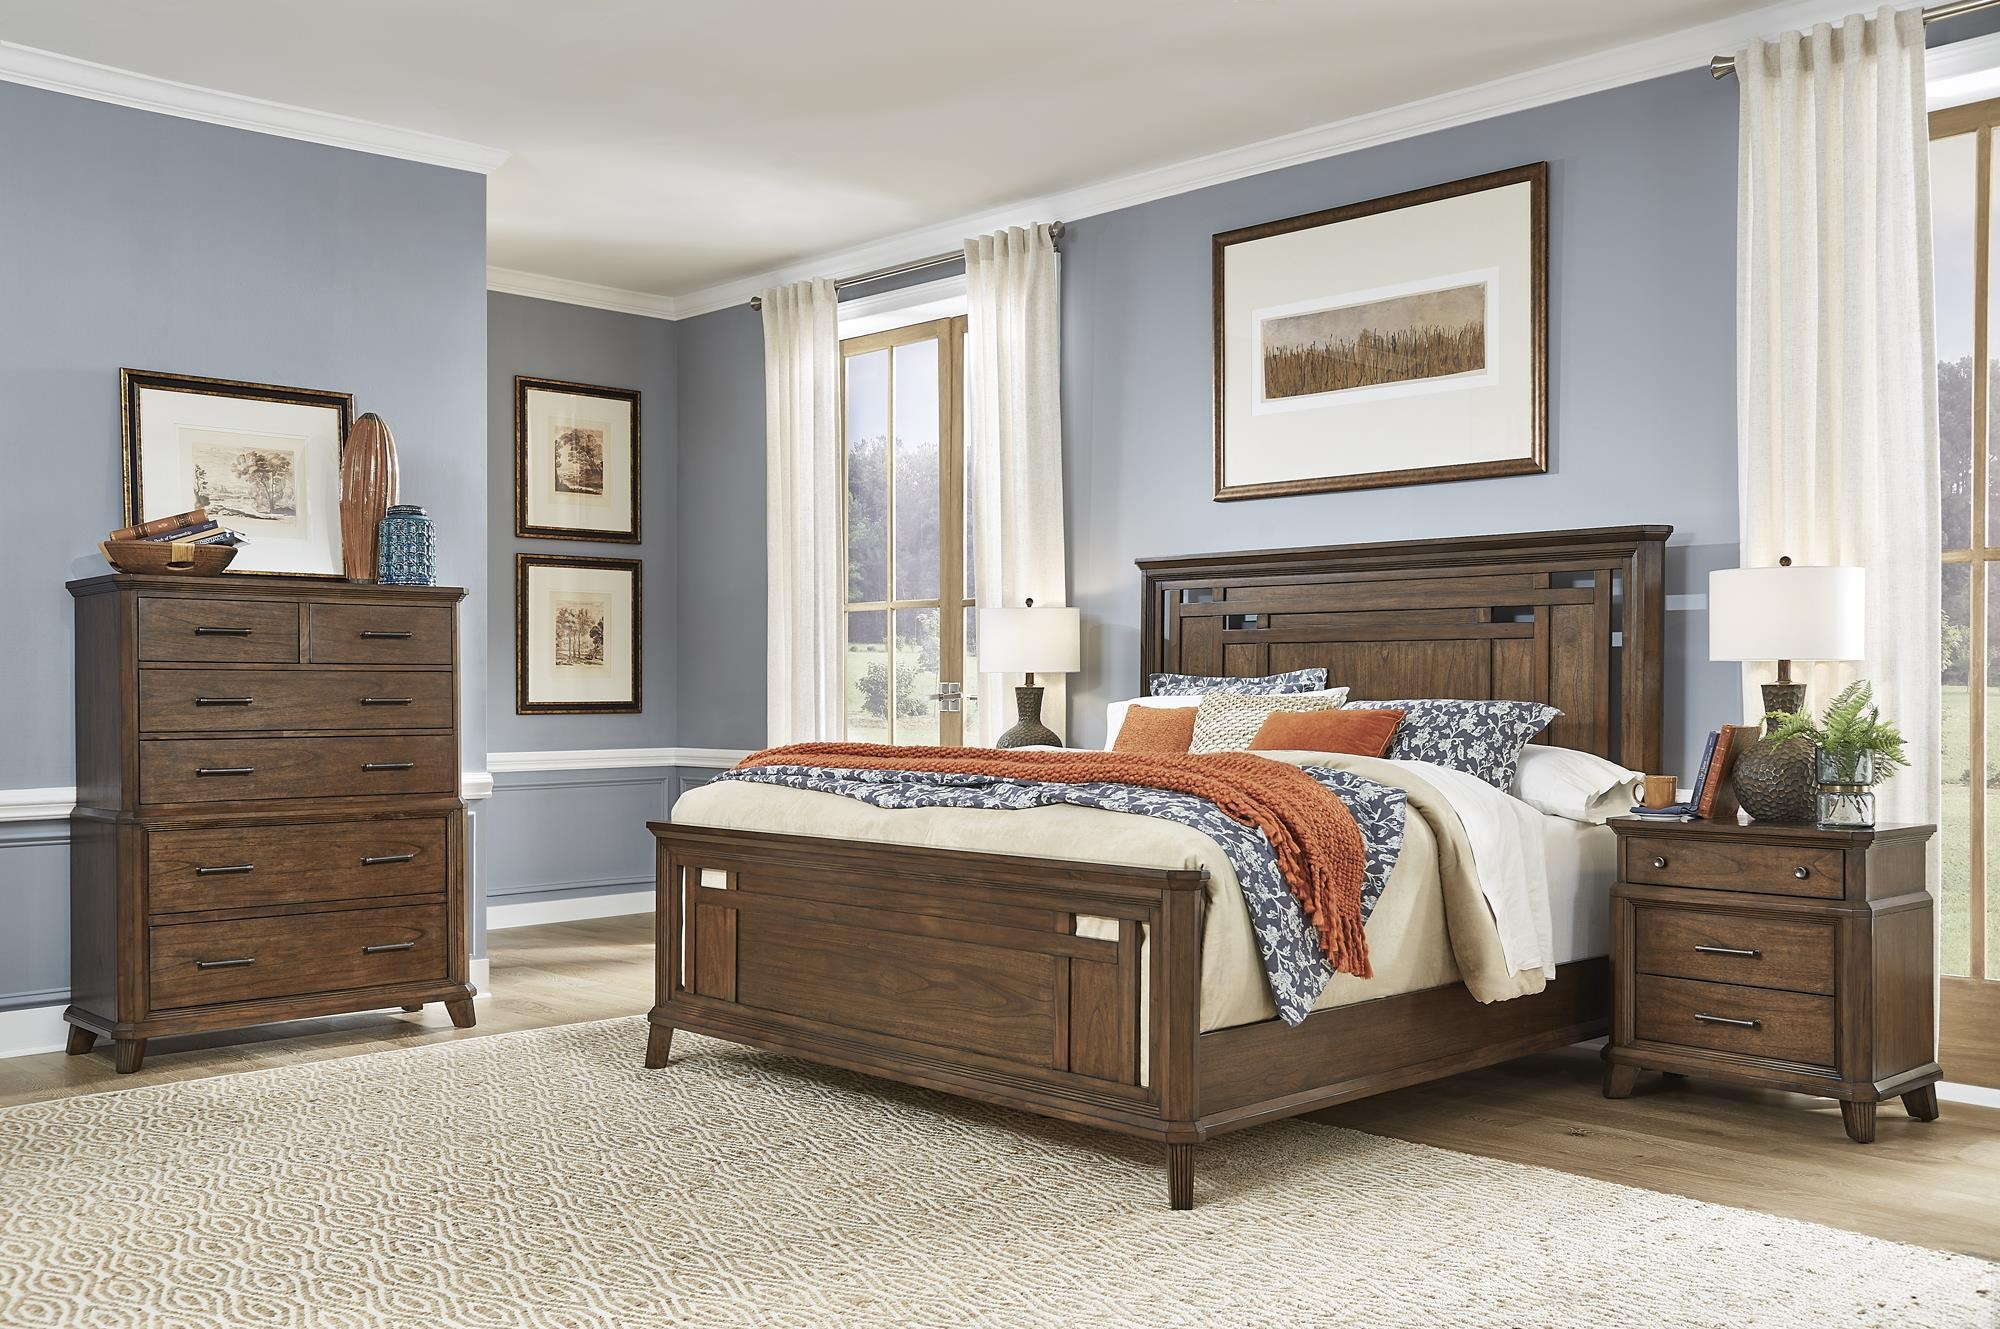 Filson Creek 5 Piece King Bedroom Set by AAmerica at Sam Levitz Furniture